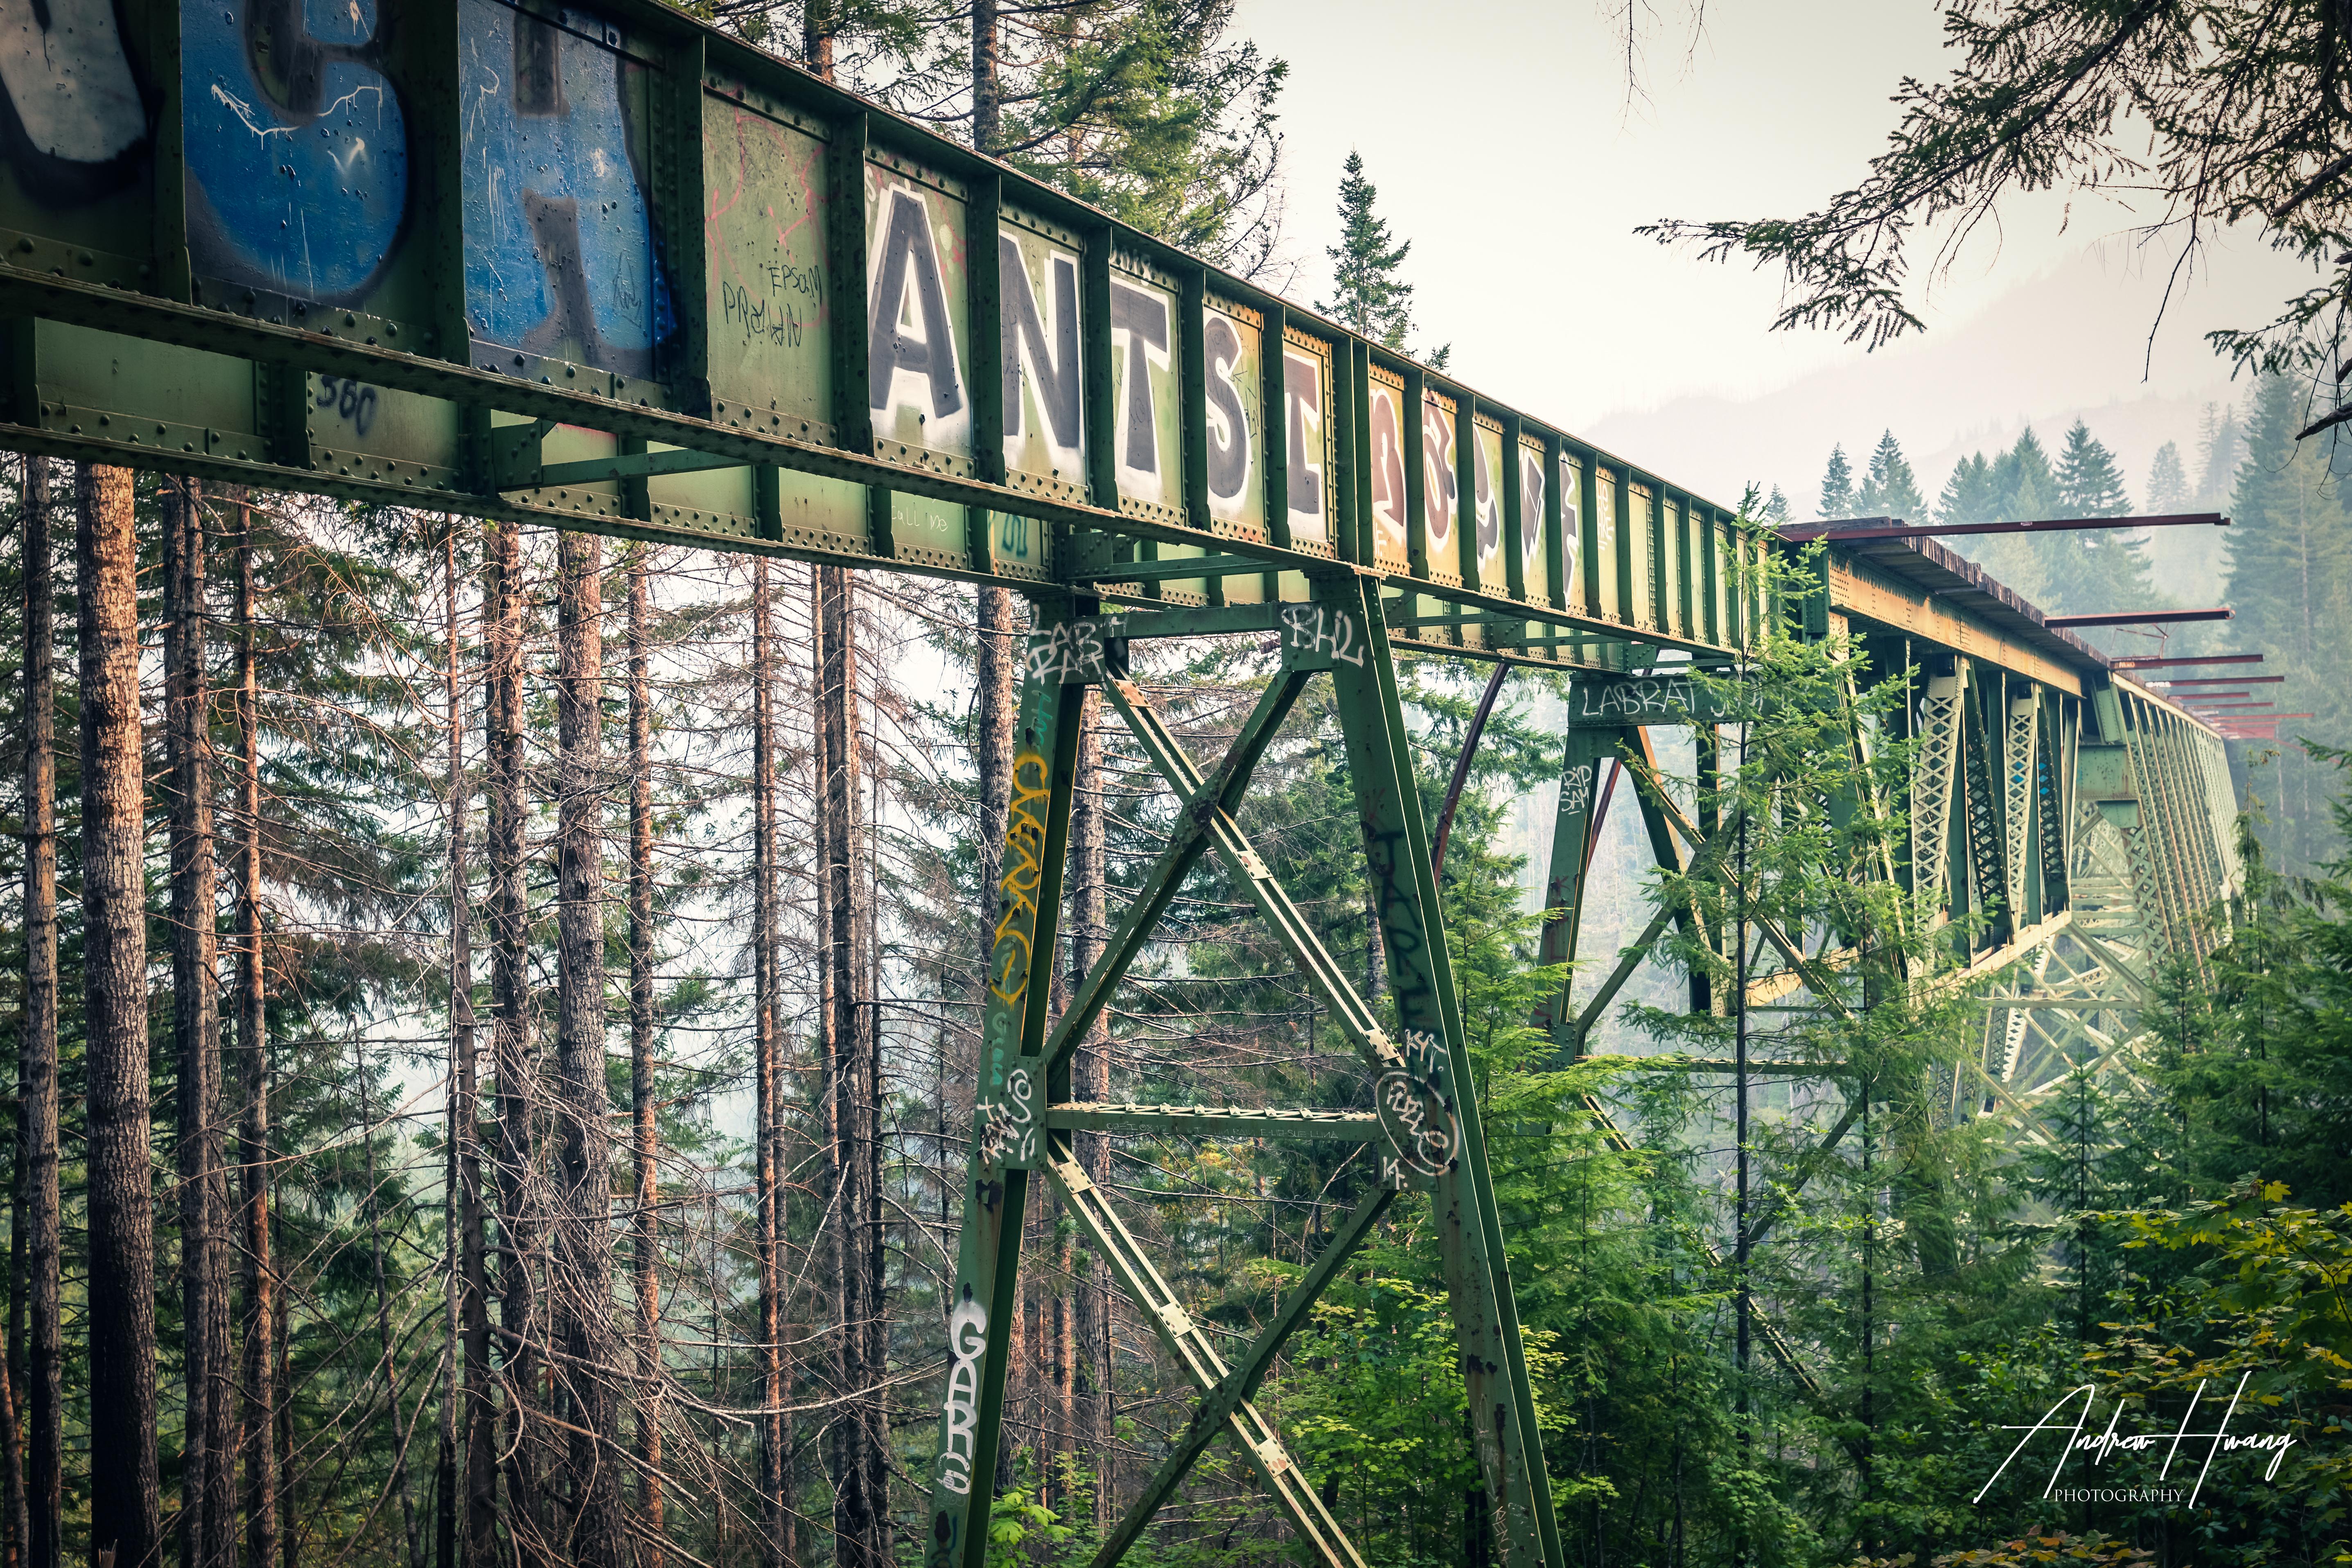 Shelton Vance Creek Bridge 4